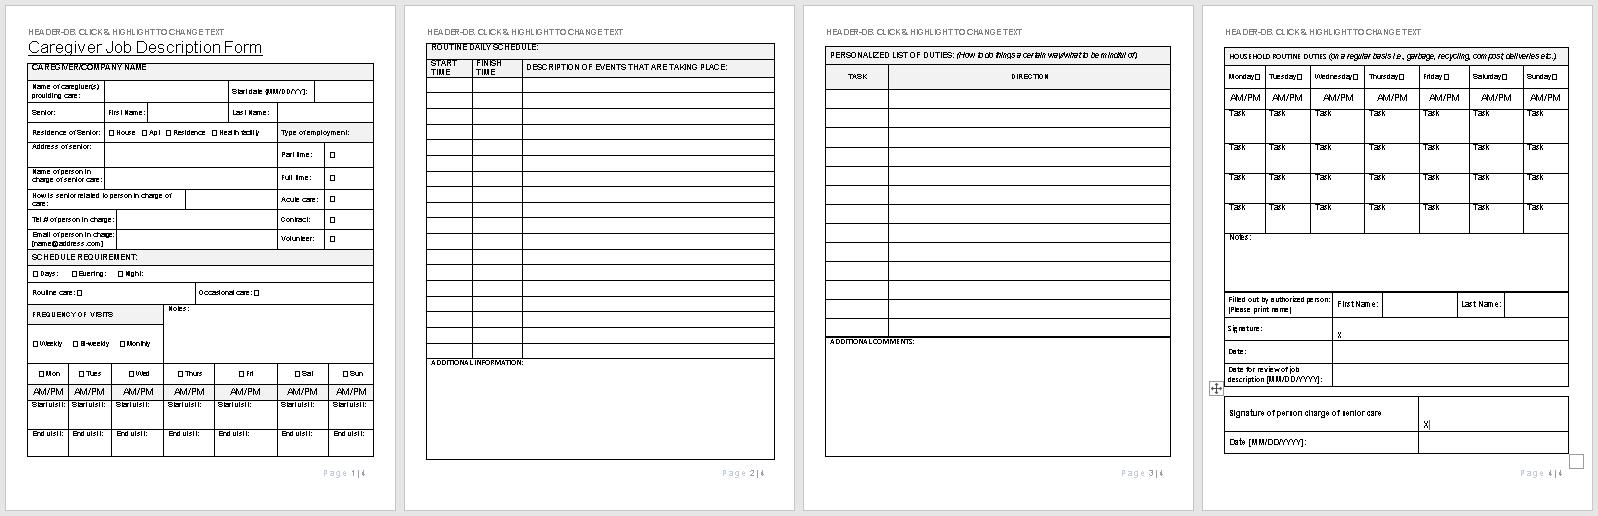 Caregiver Job Description Form-full preview of template-wise caregiving